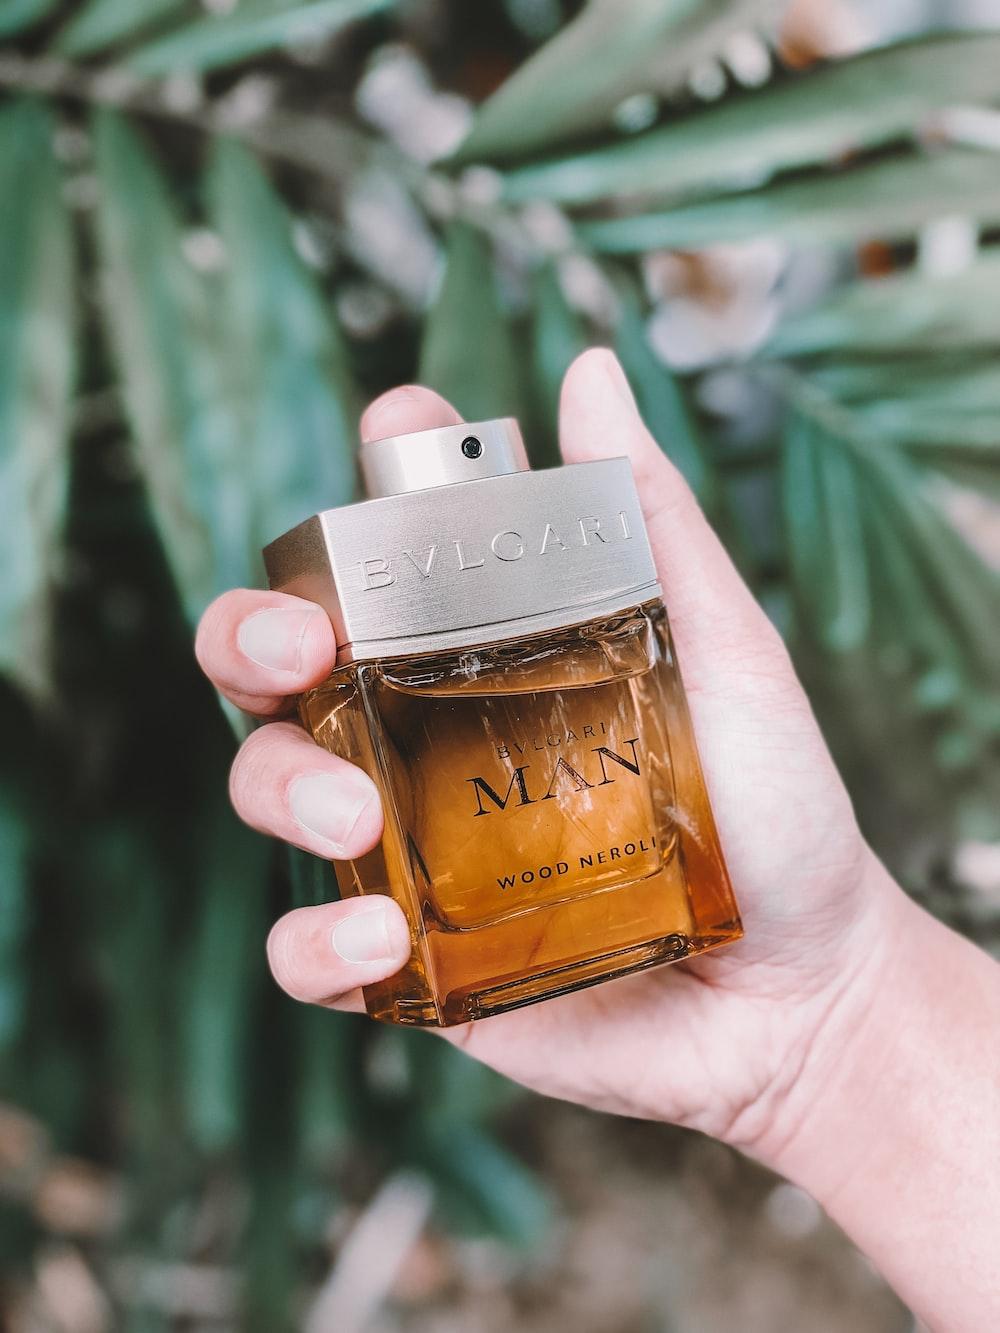 person holding calvin klein perfume bottle